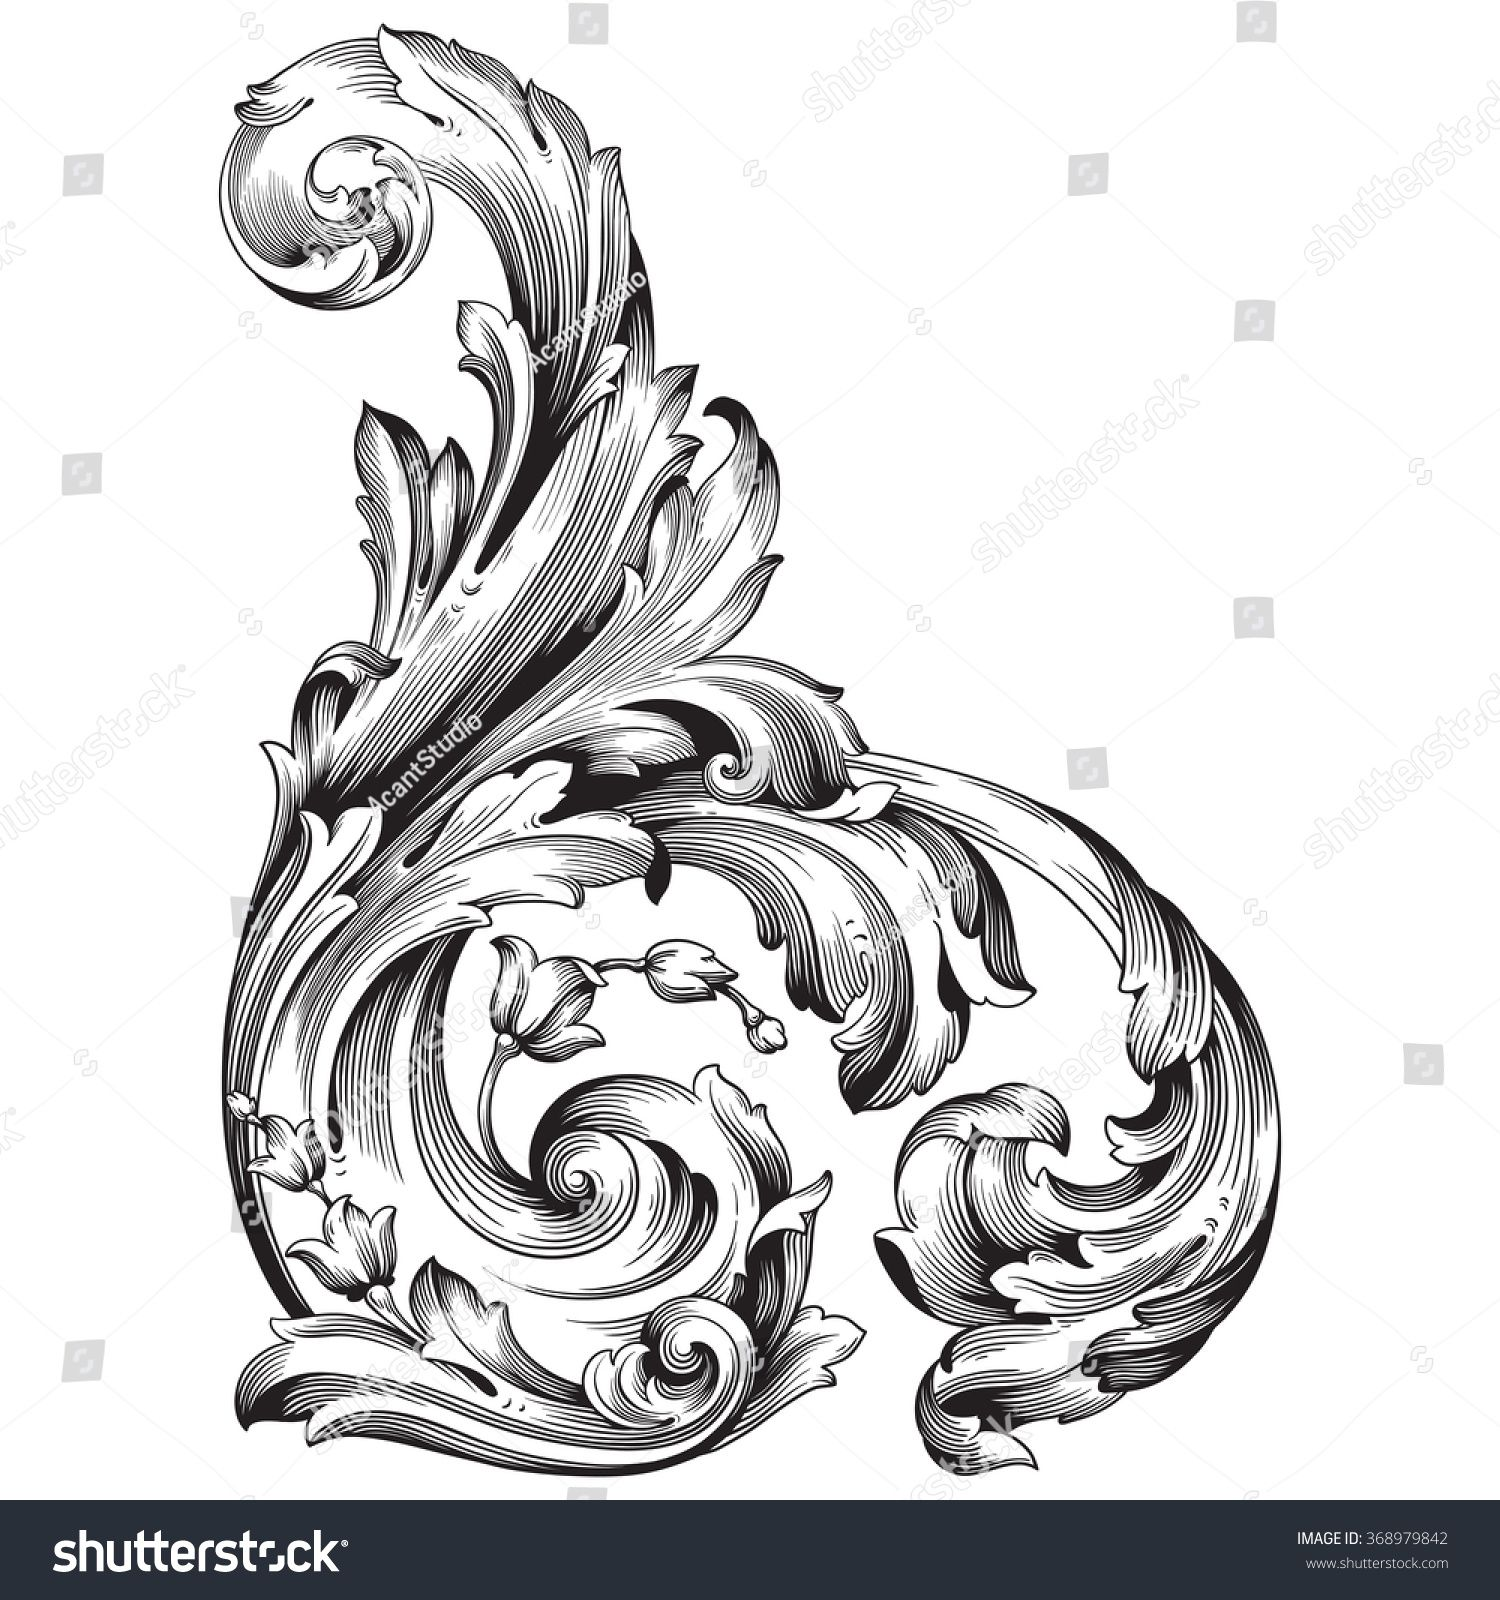 Vintage Baroque Frame Scroll Ornament Engraving Border Floral Retro Pattern Antique Style Acanthus Foliage Swir Filigree Tattoo Baroque Ornament Baroque Tattoo